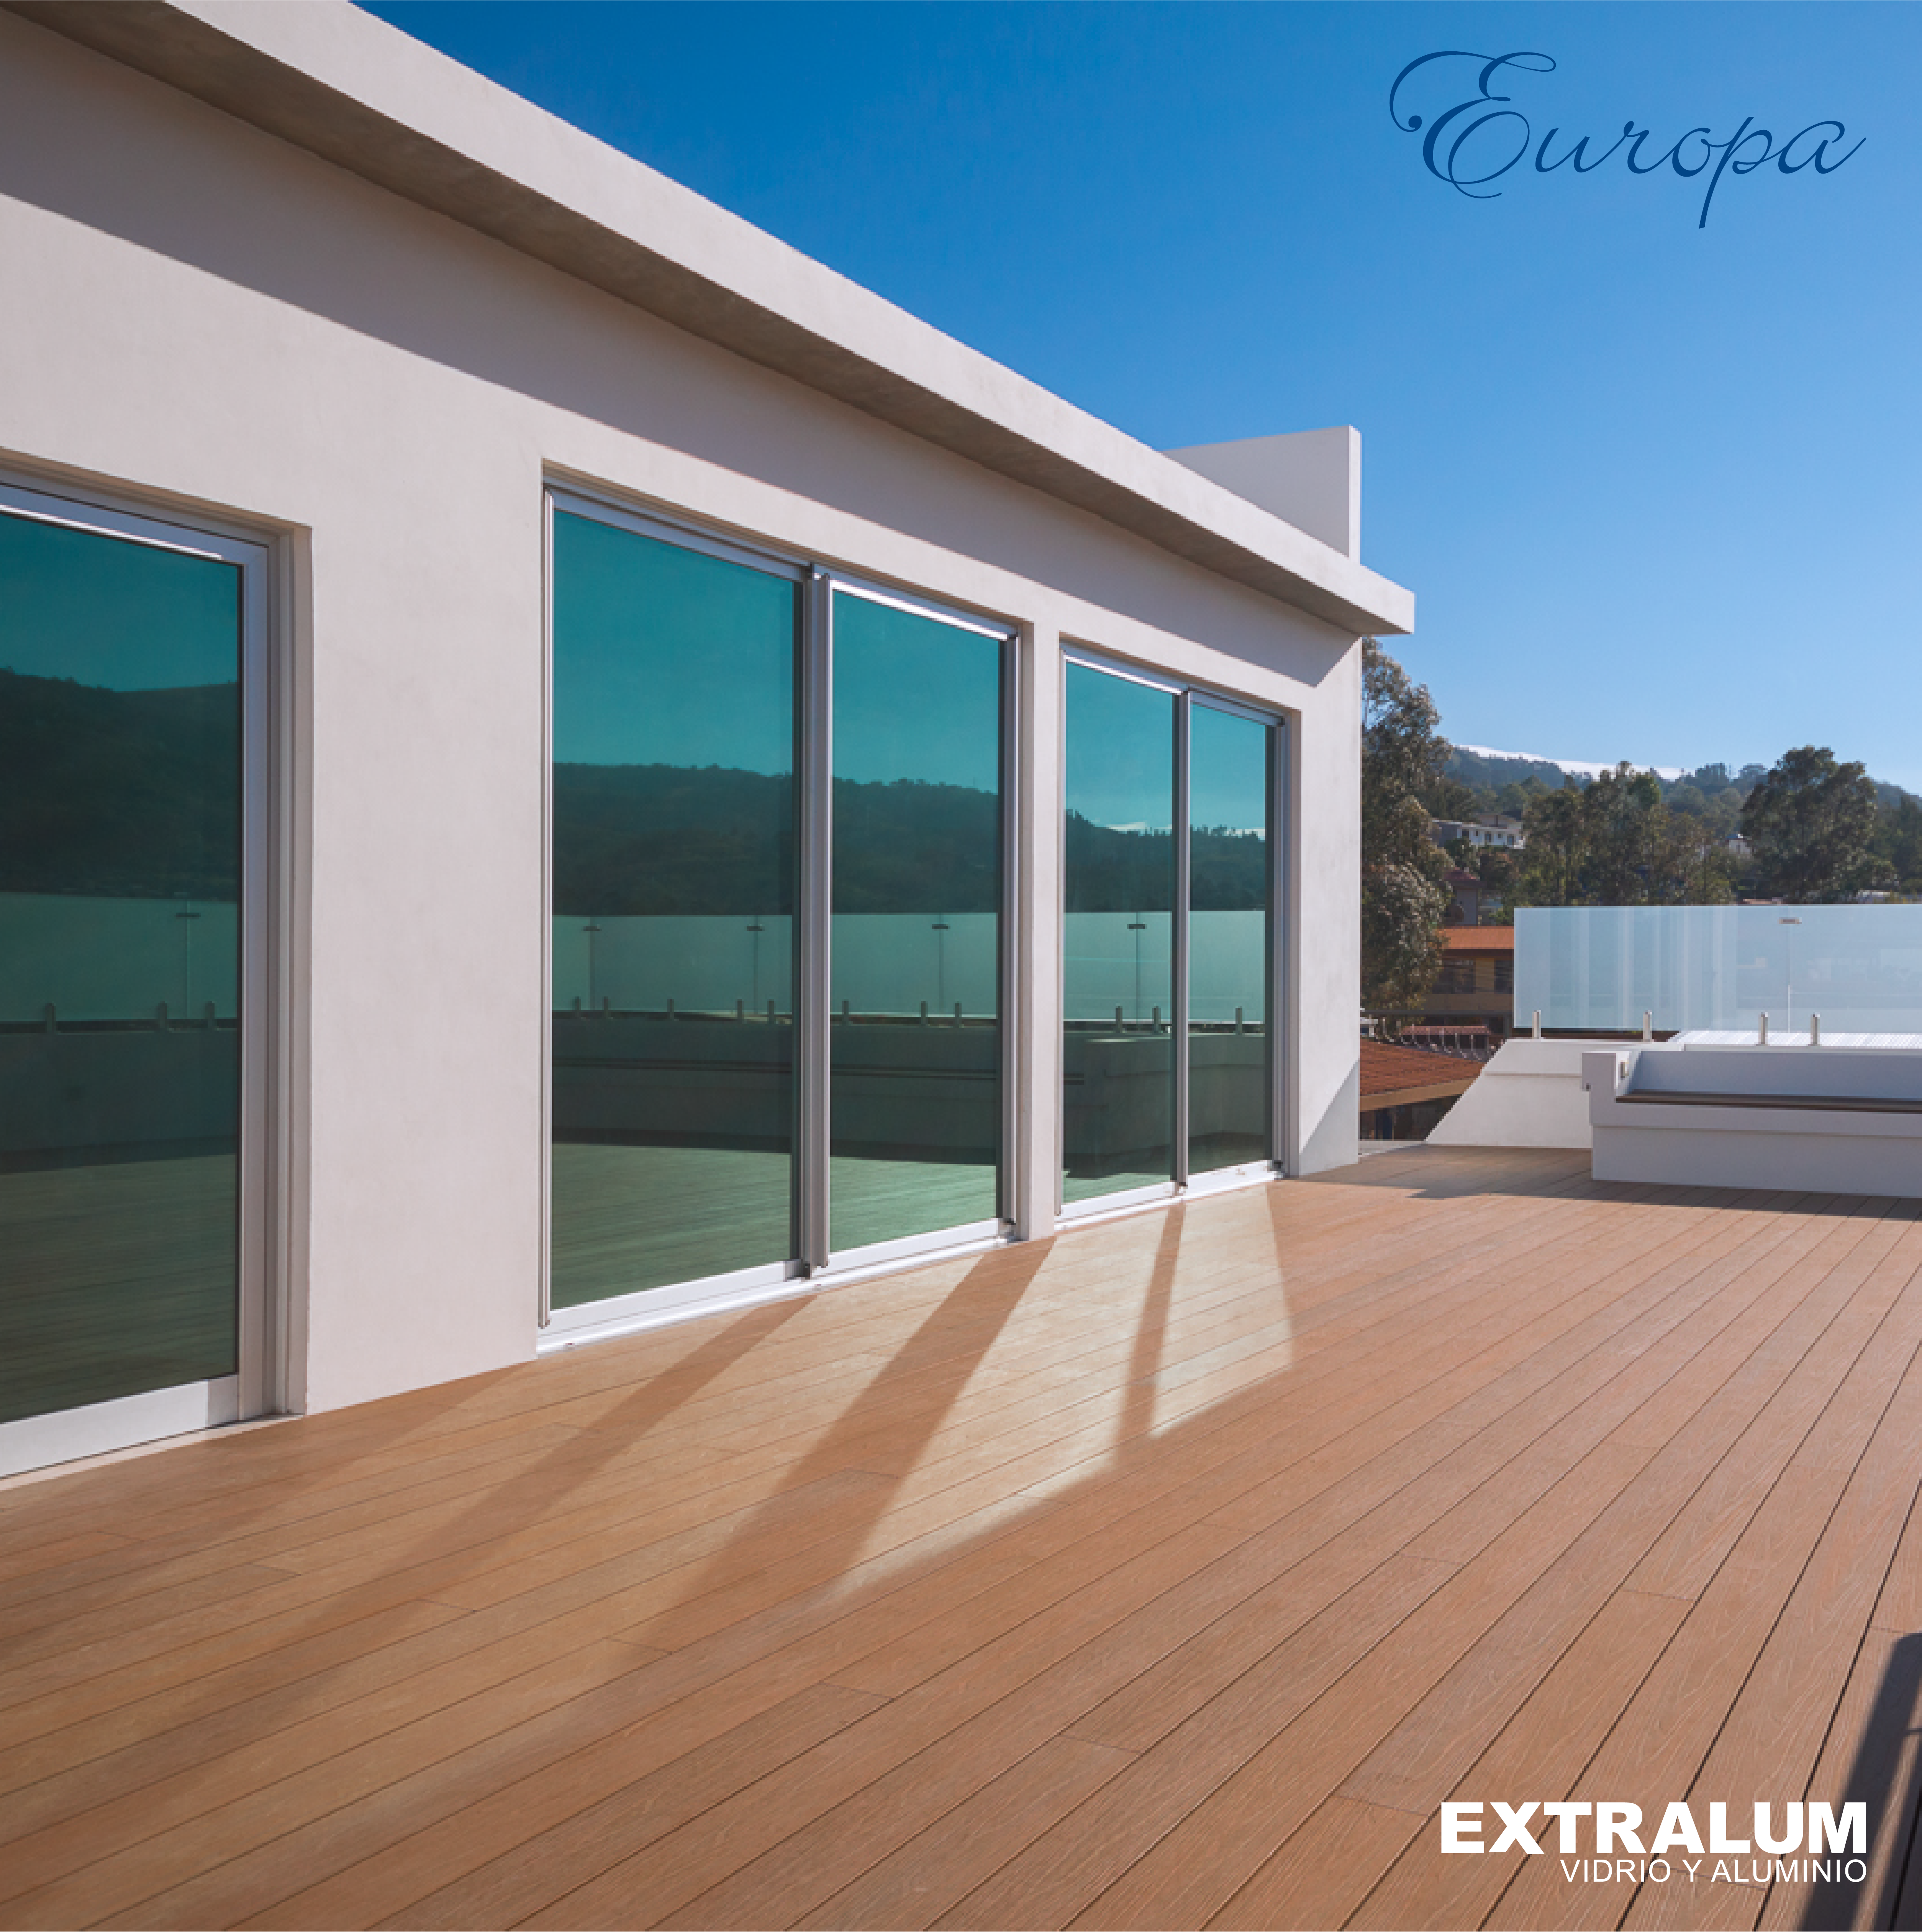 Cada Detalle Hace La Diferencia Productosextralum Europa Puerta Aluminio Outdoor Decor Decor Home